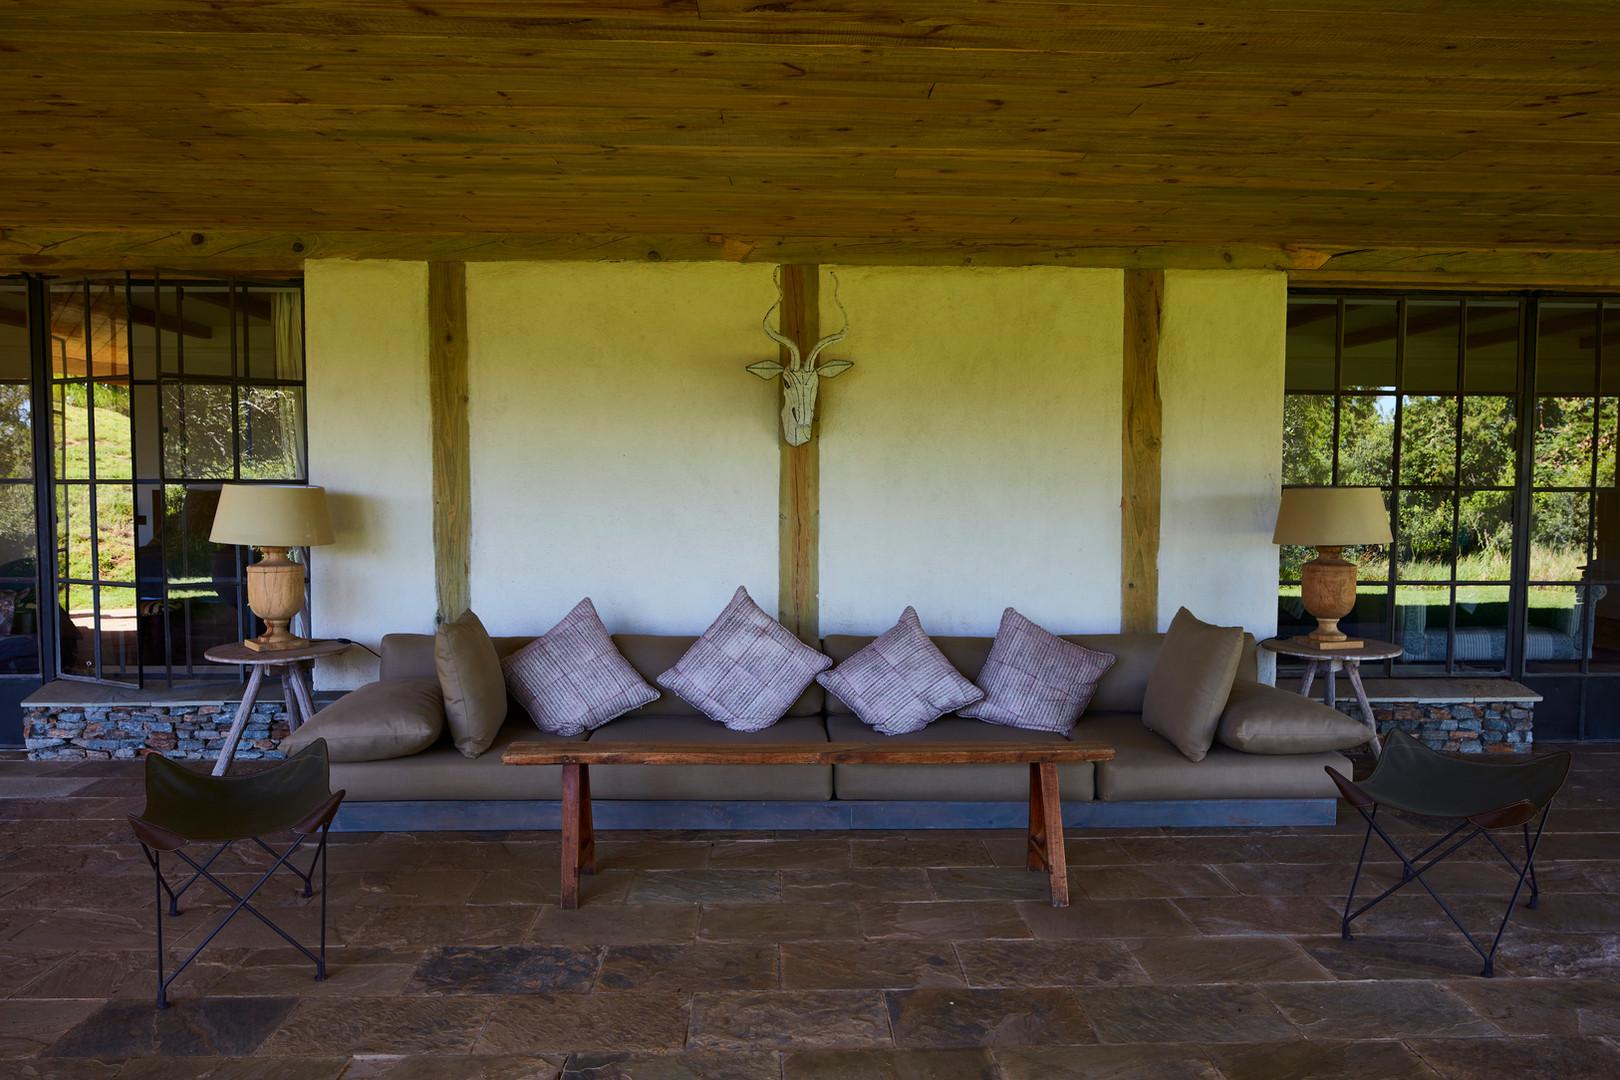 Bedroom verandah